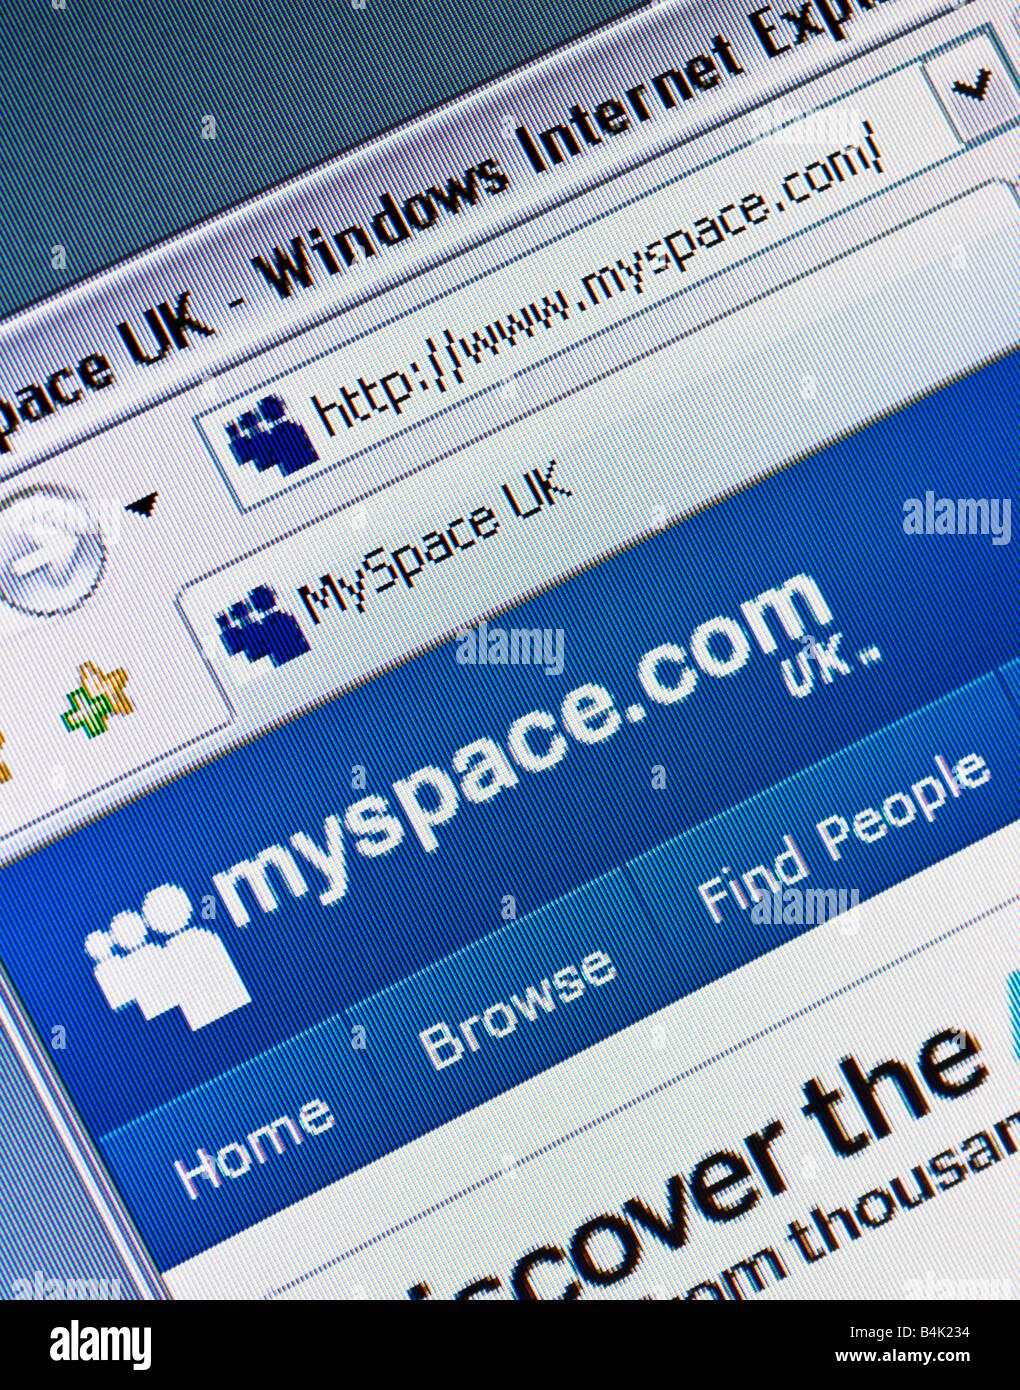 Myspace Logo Stock Photos Myspace Logo Stock Images Alamy